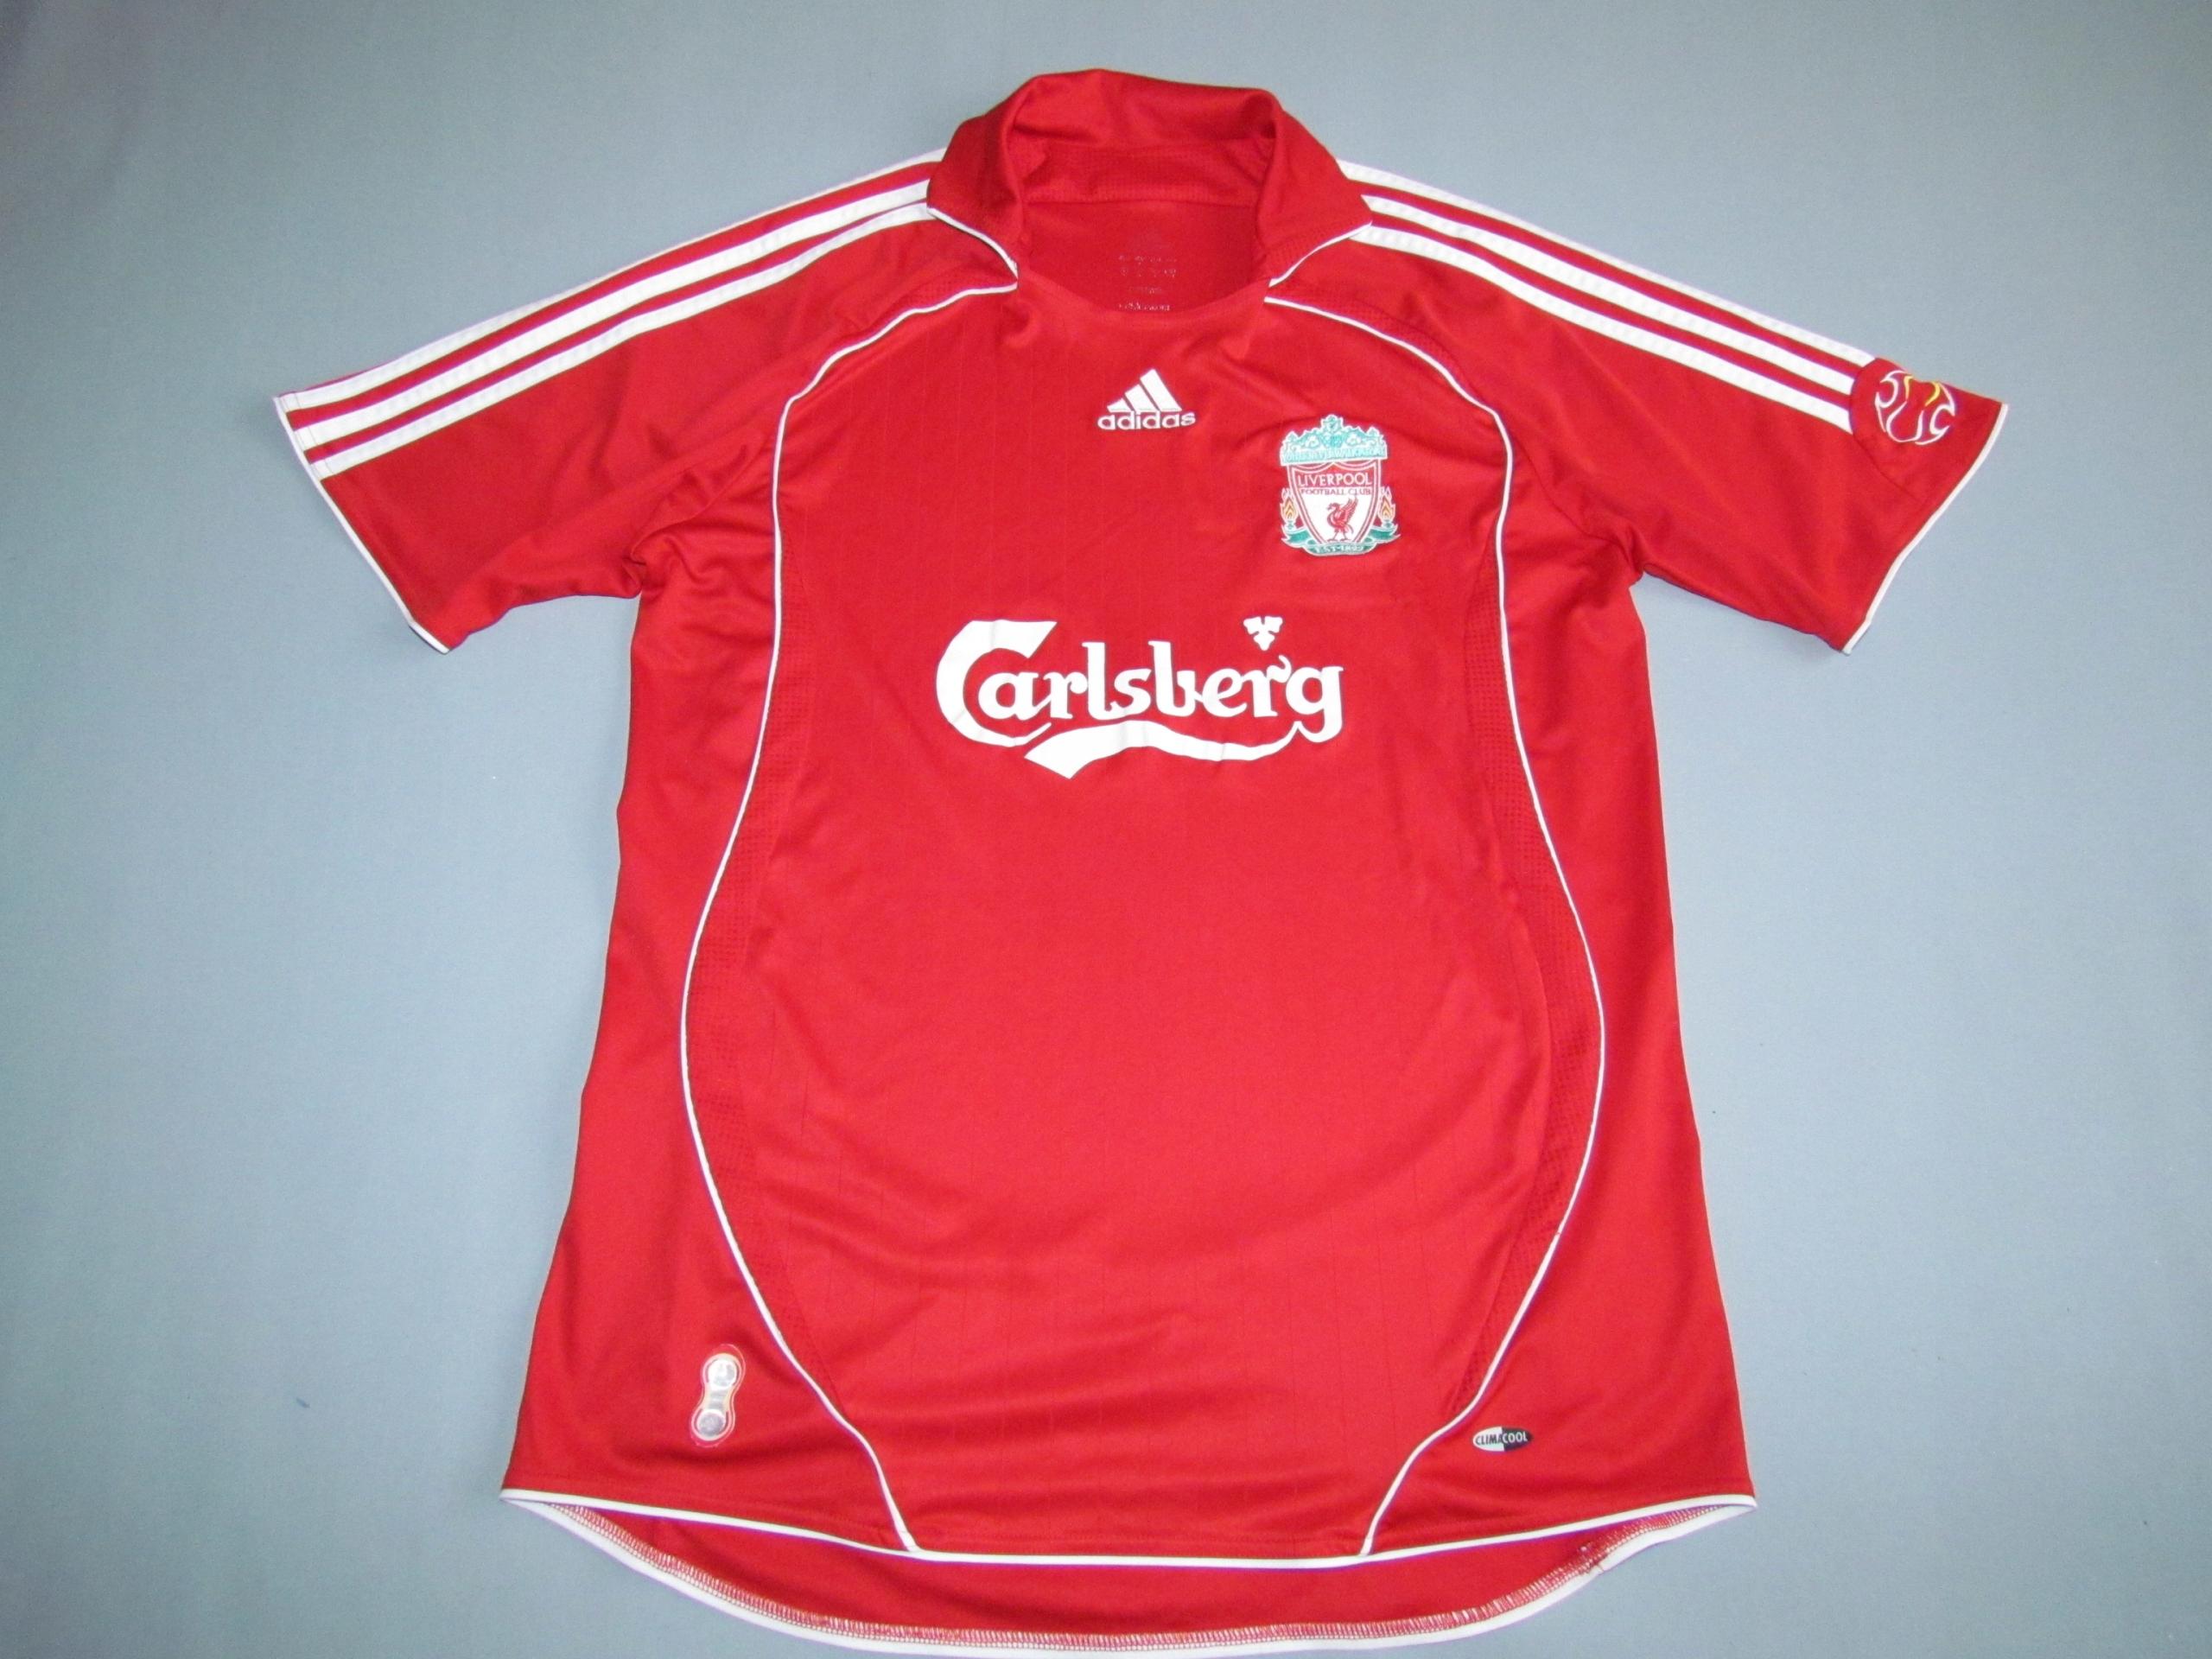 Koszulka Adidas Liverpool roz.L